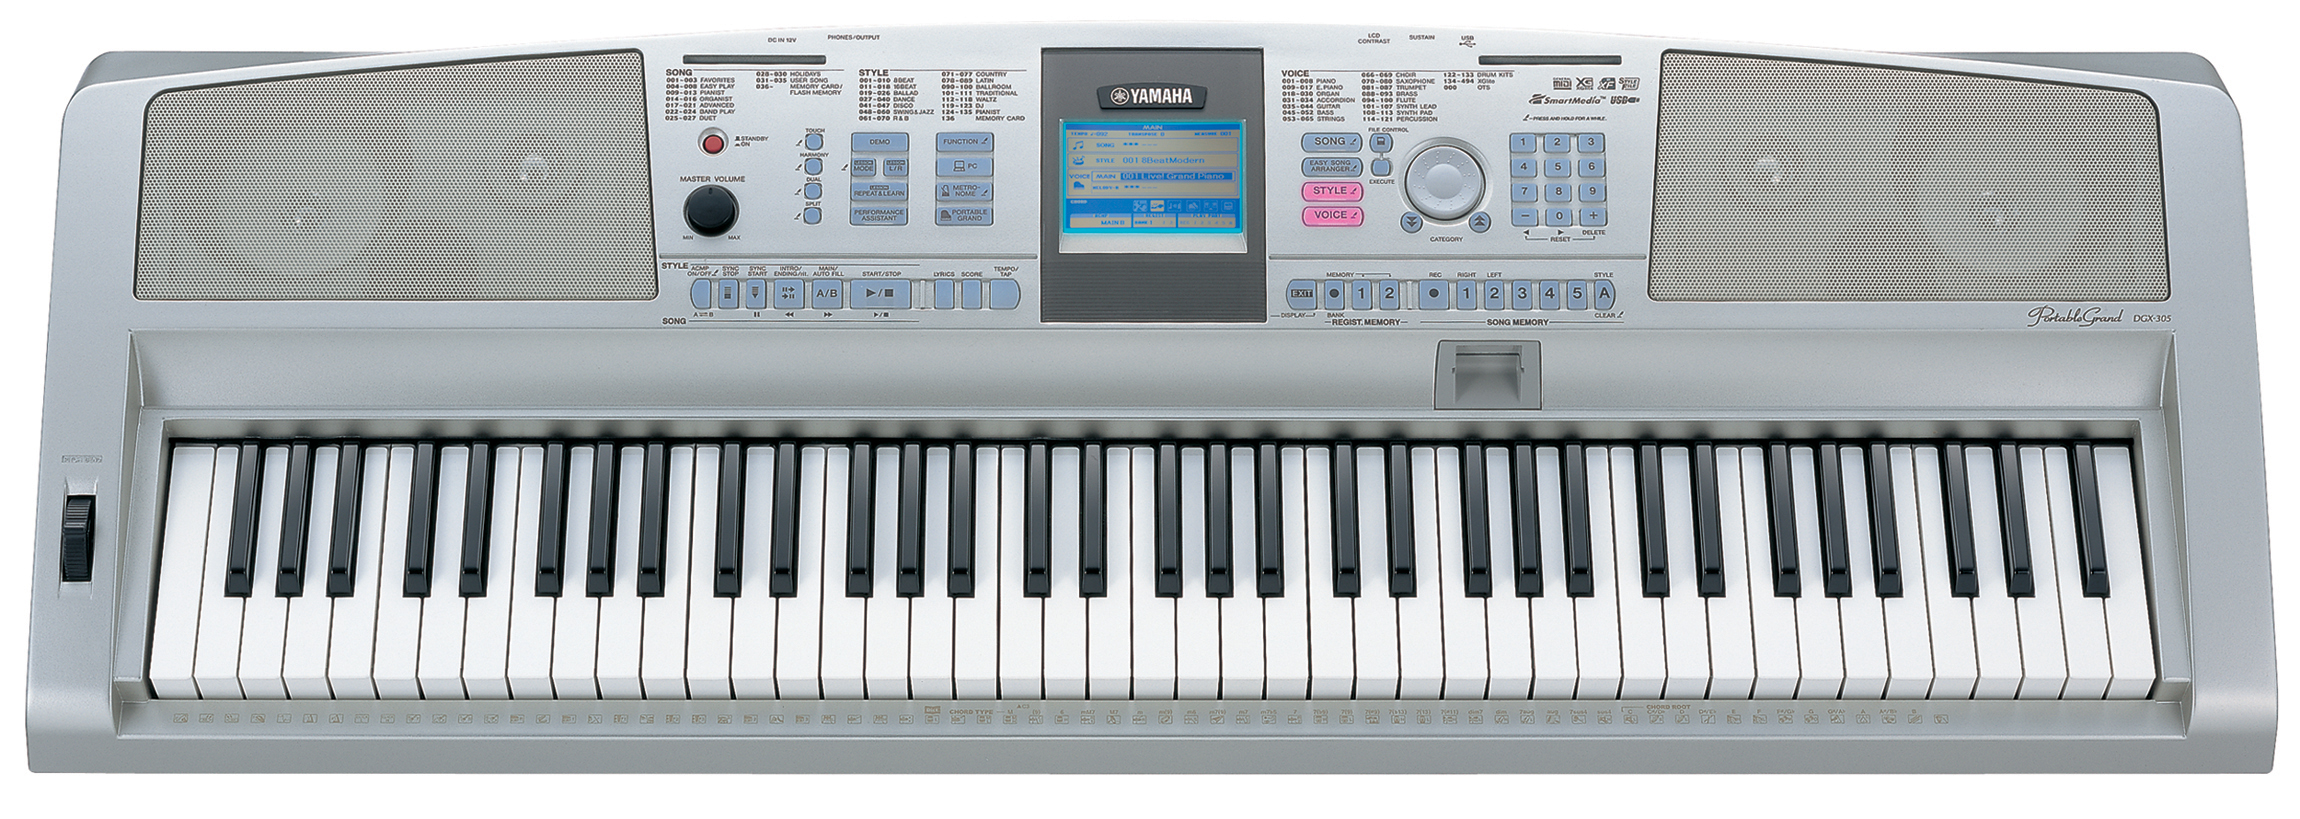 Synth: Yamaha DGX-305